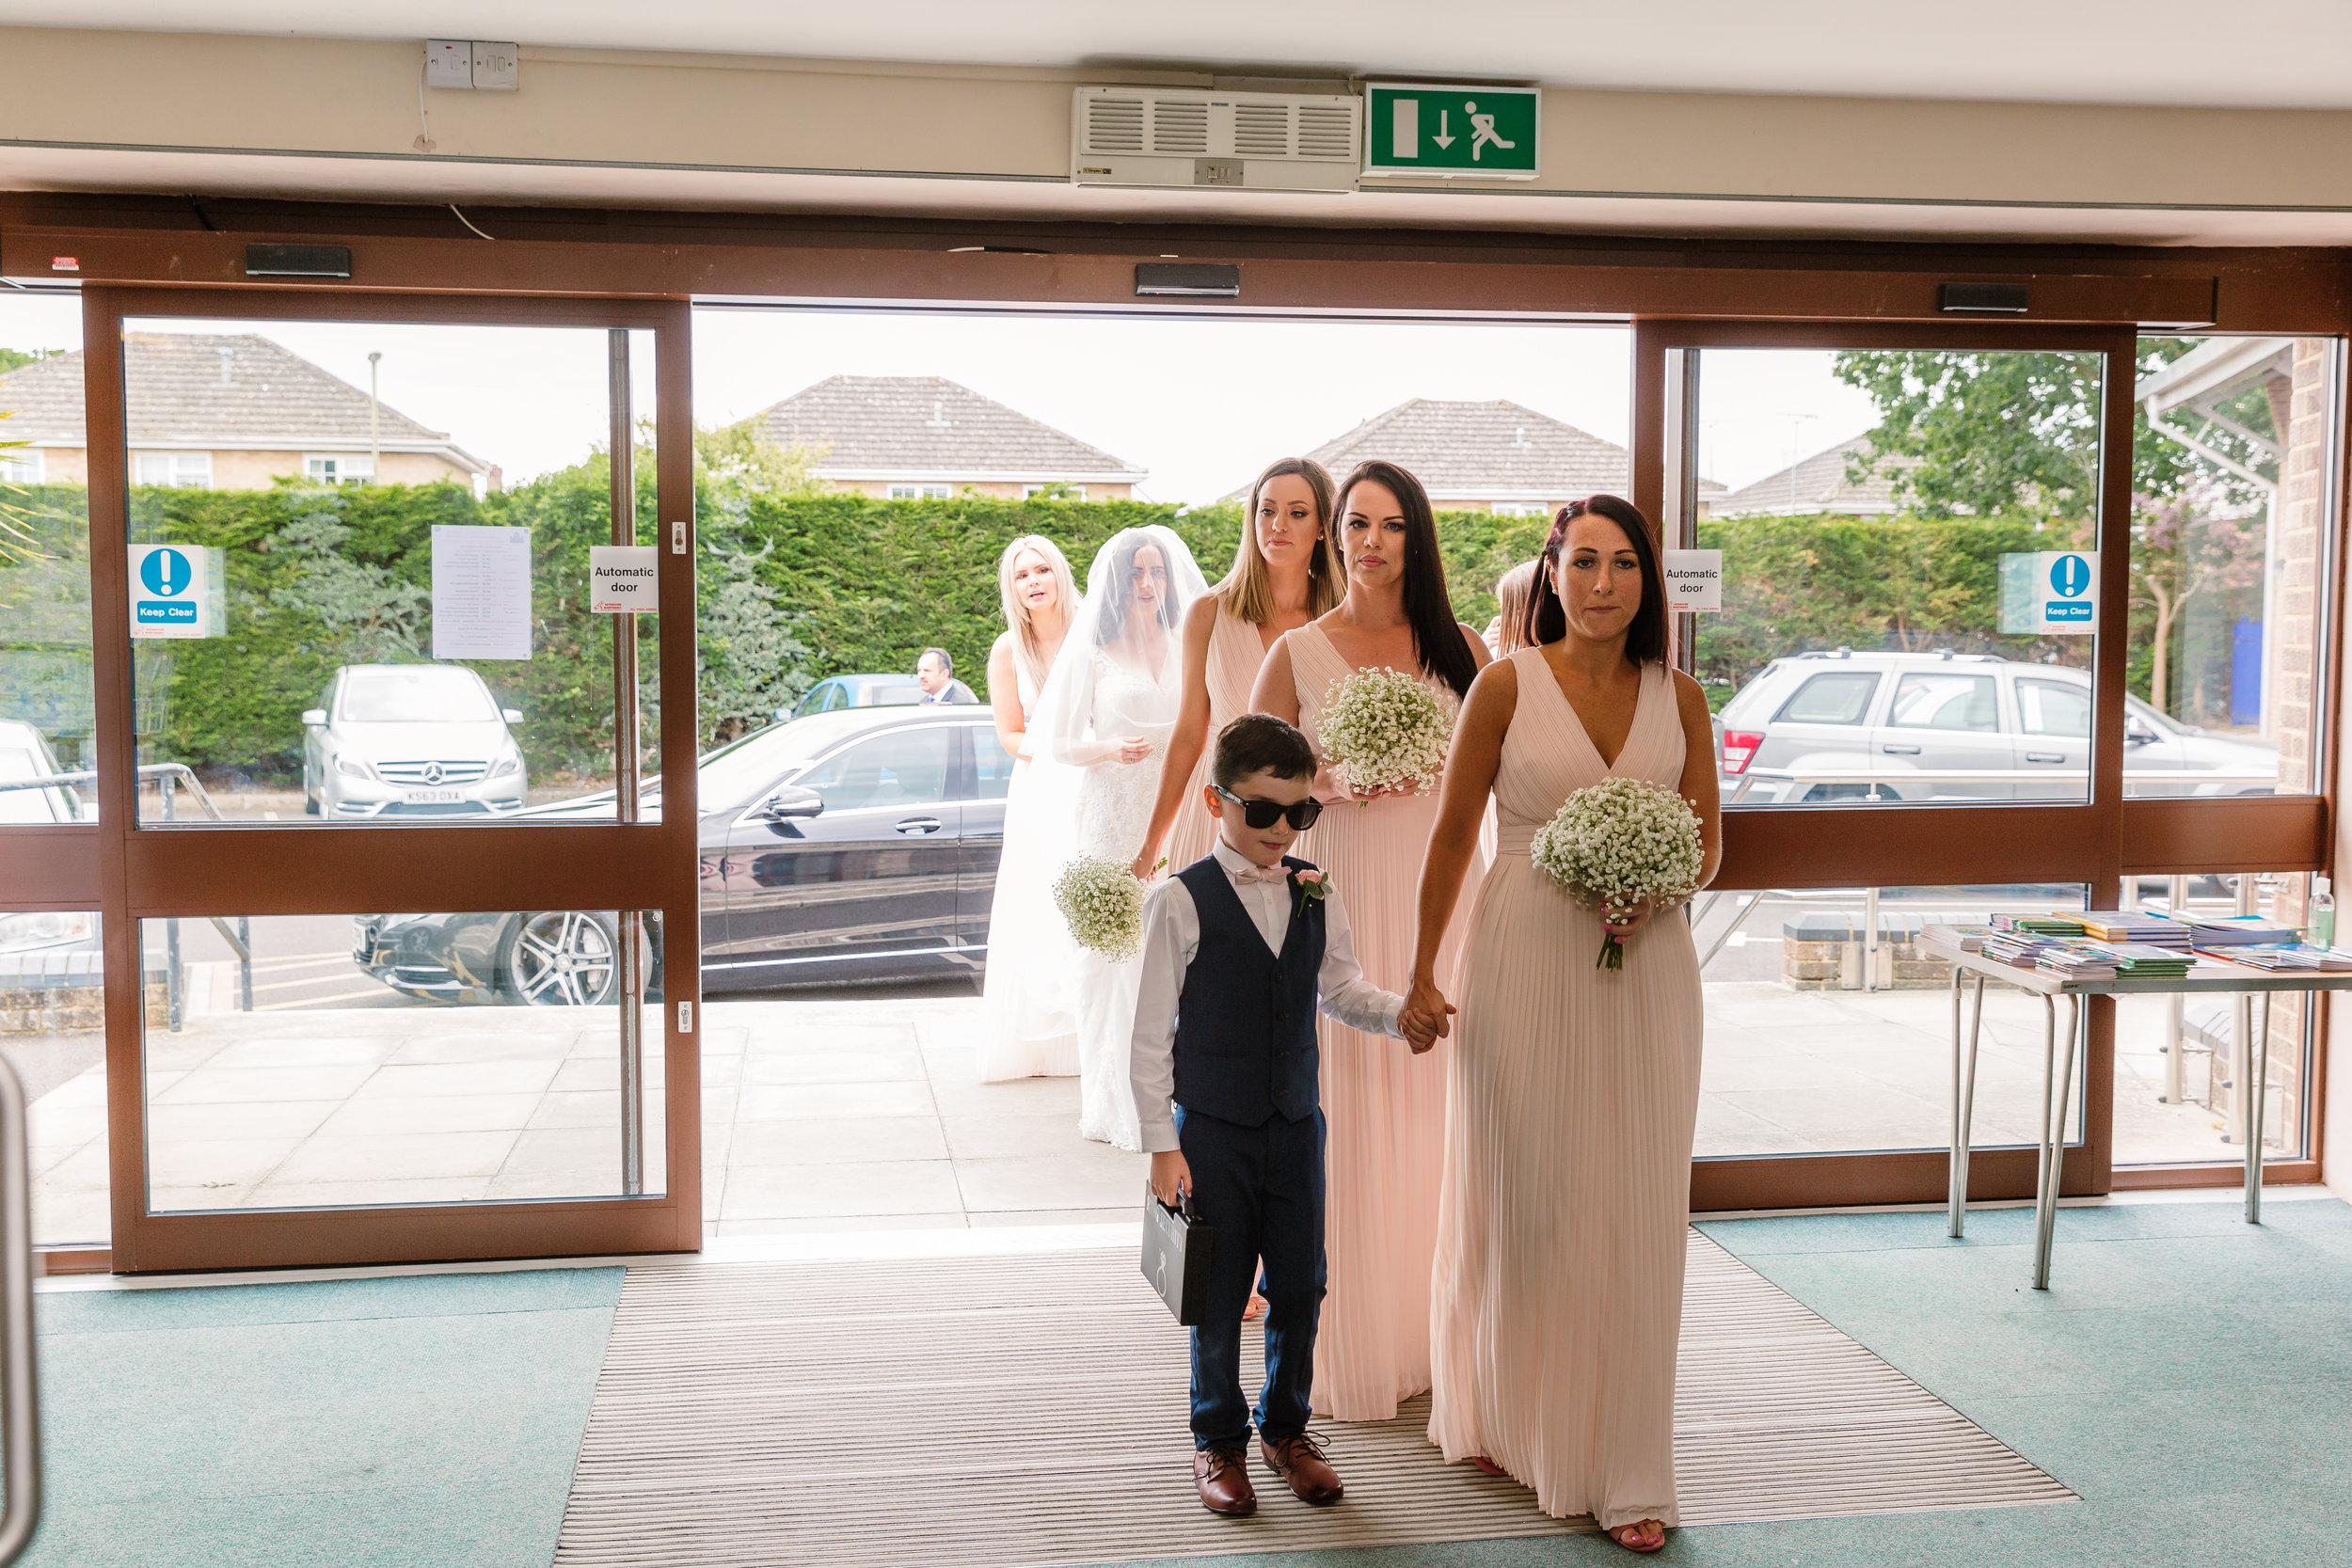 Sarah-Fishlock-Photography : Hampshire-wedding-photographer-hampshire : fleet-wedding-photographer-fleet : Meade-Hall-Wedding-Photographer : Meade-Hall-Wedding-Photos-410.jpg